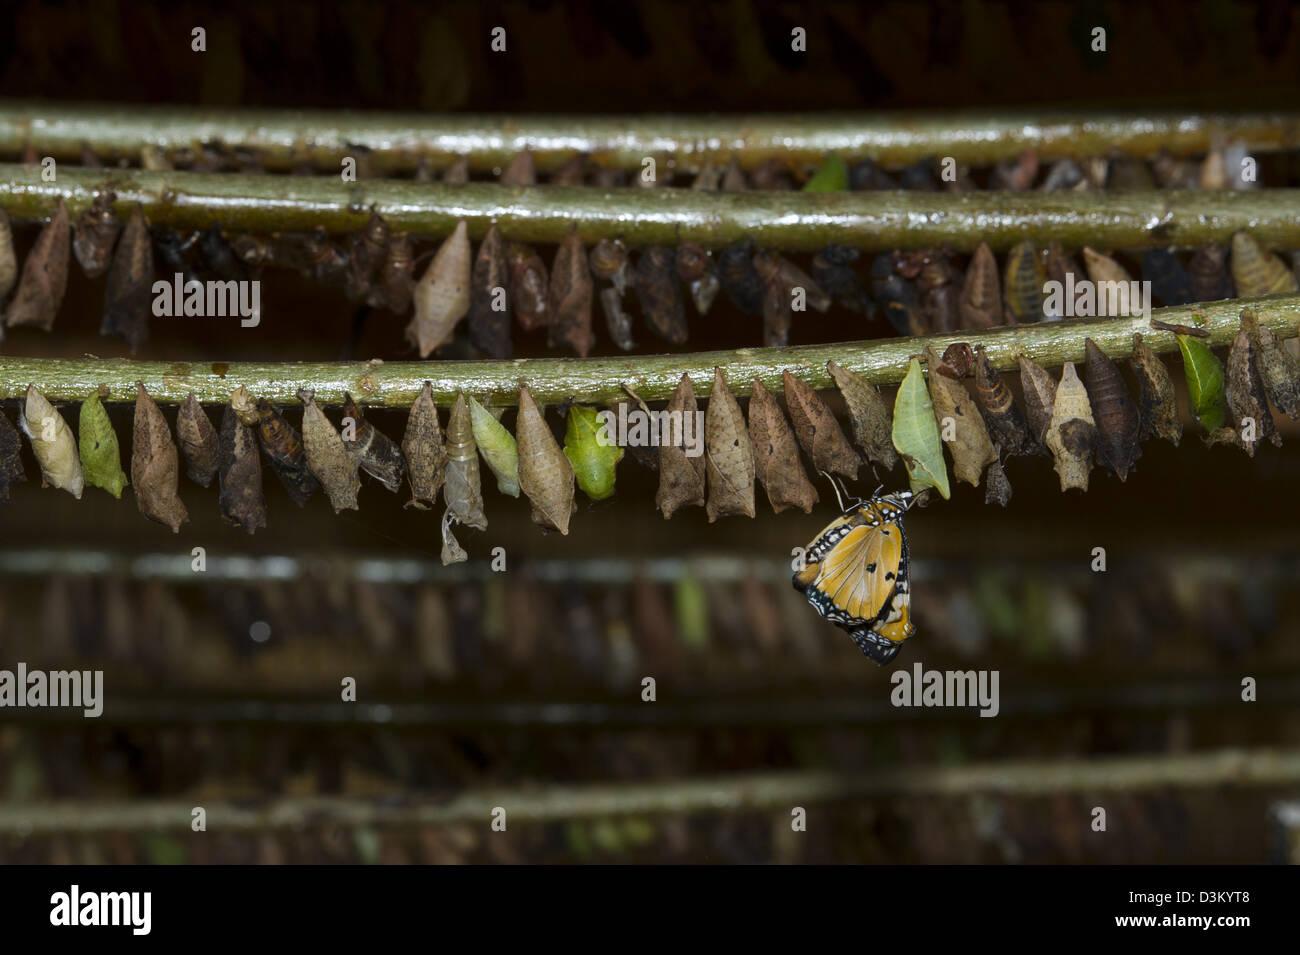 Pupa (crisálida), Proyecto Kipepeo Butterfly Farm, Arabuko Sokoke forest, Watamu, Kenya Foto de stock